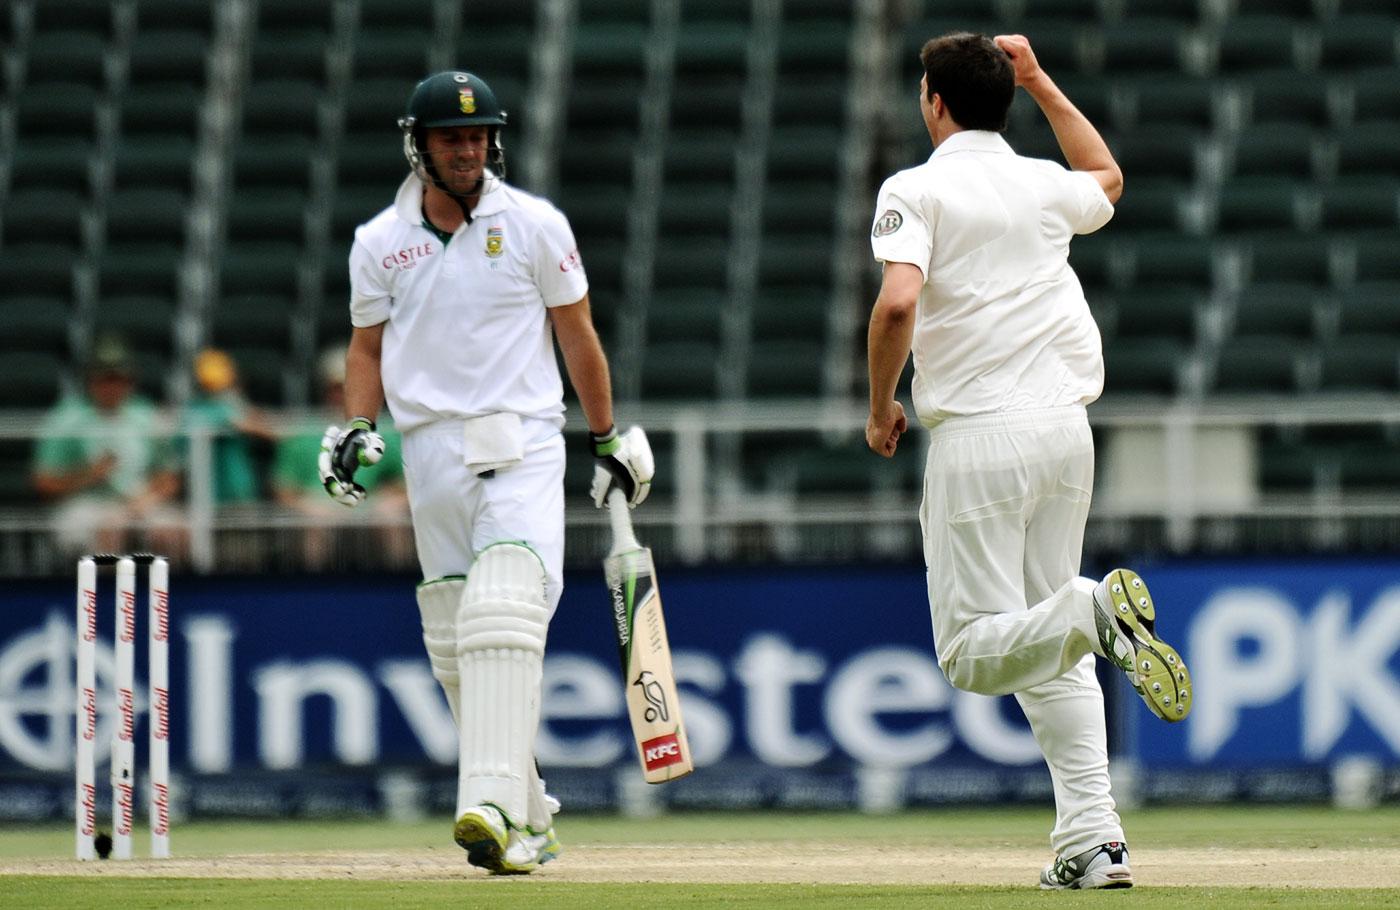 Big-ticket wicket: Cummins dismisses AB de Villiers on debut in Johannesburg, 2011